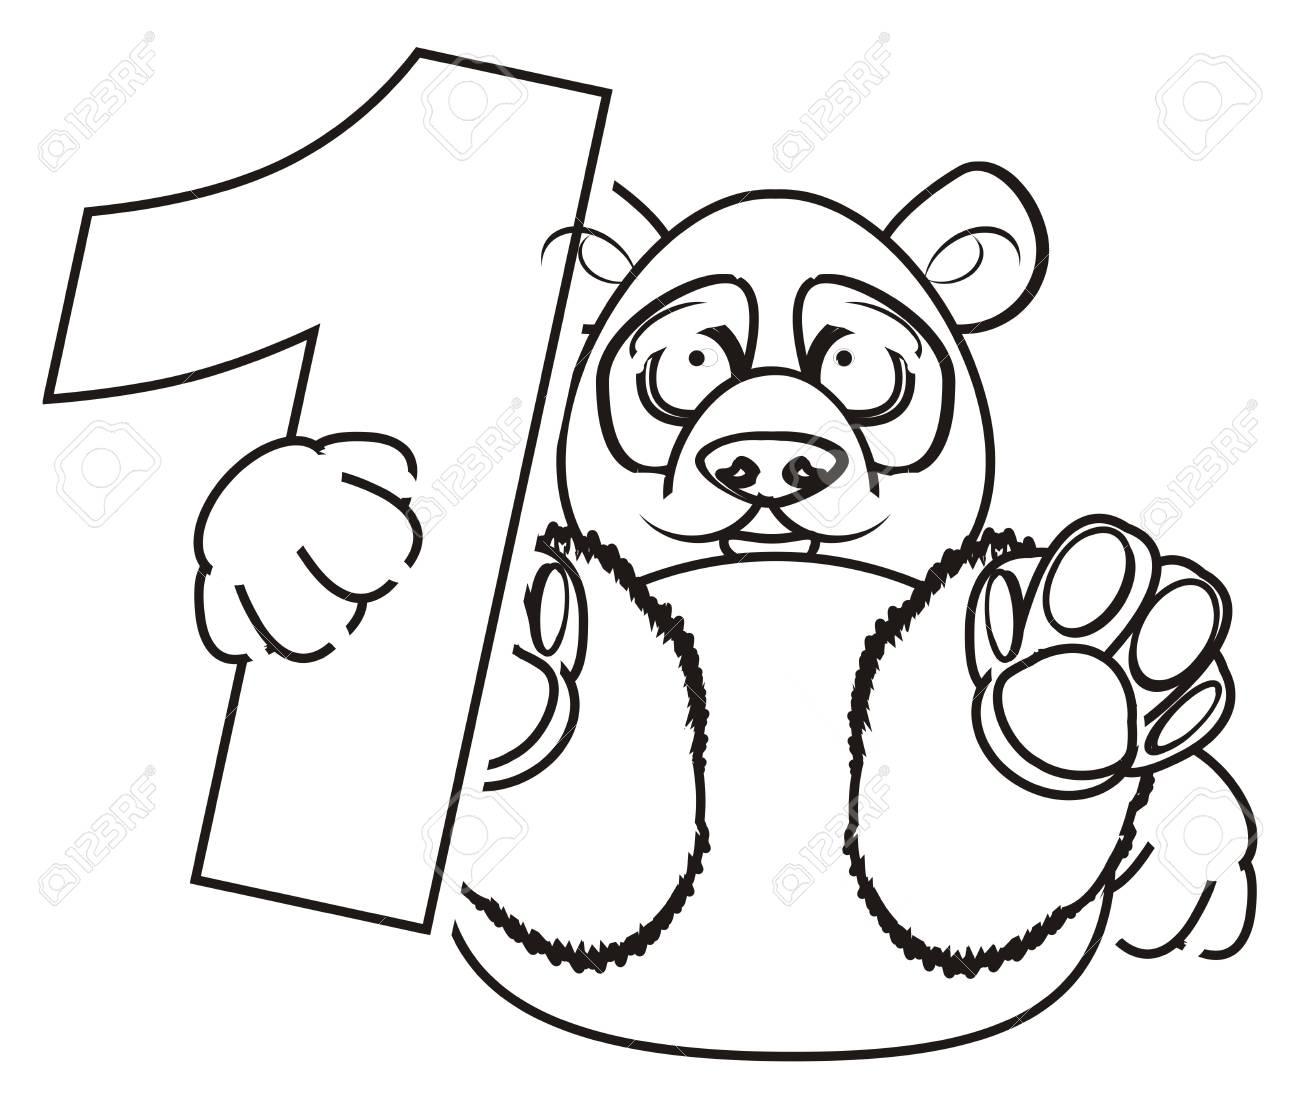 Panda Para Colorear Mantenga Un Número Uno